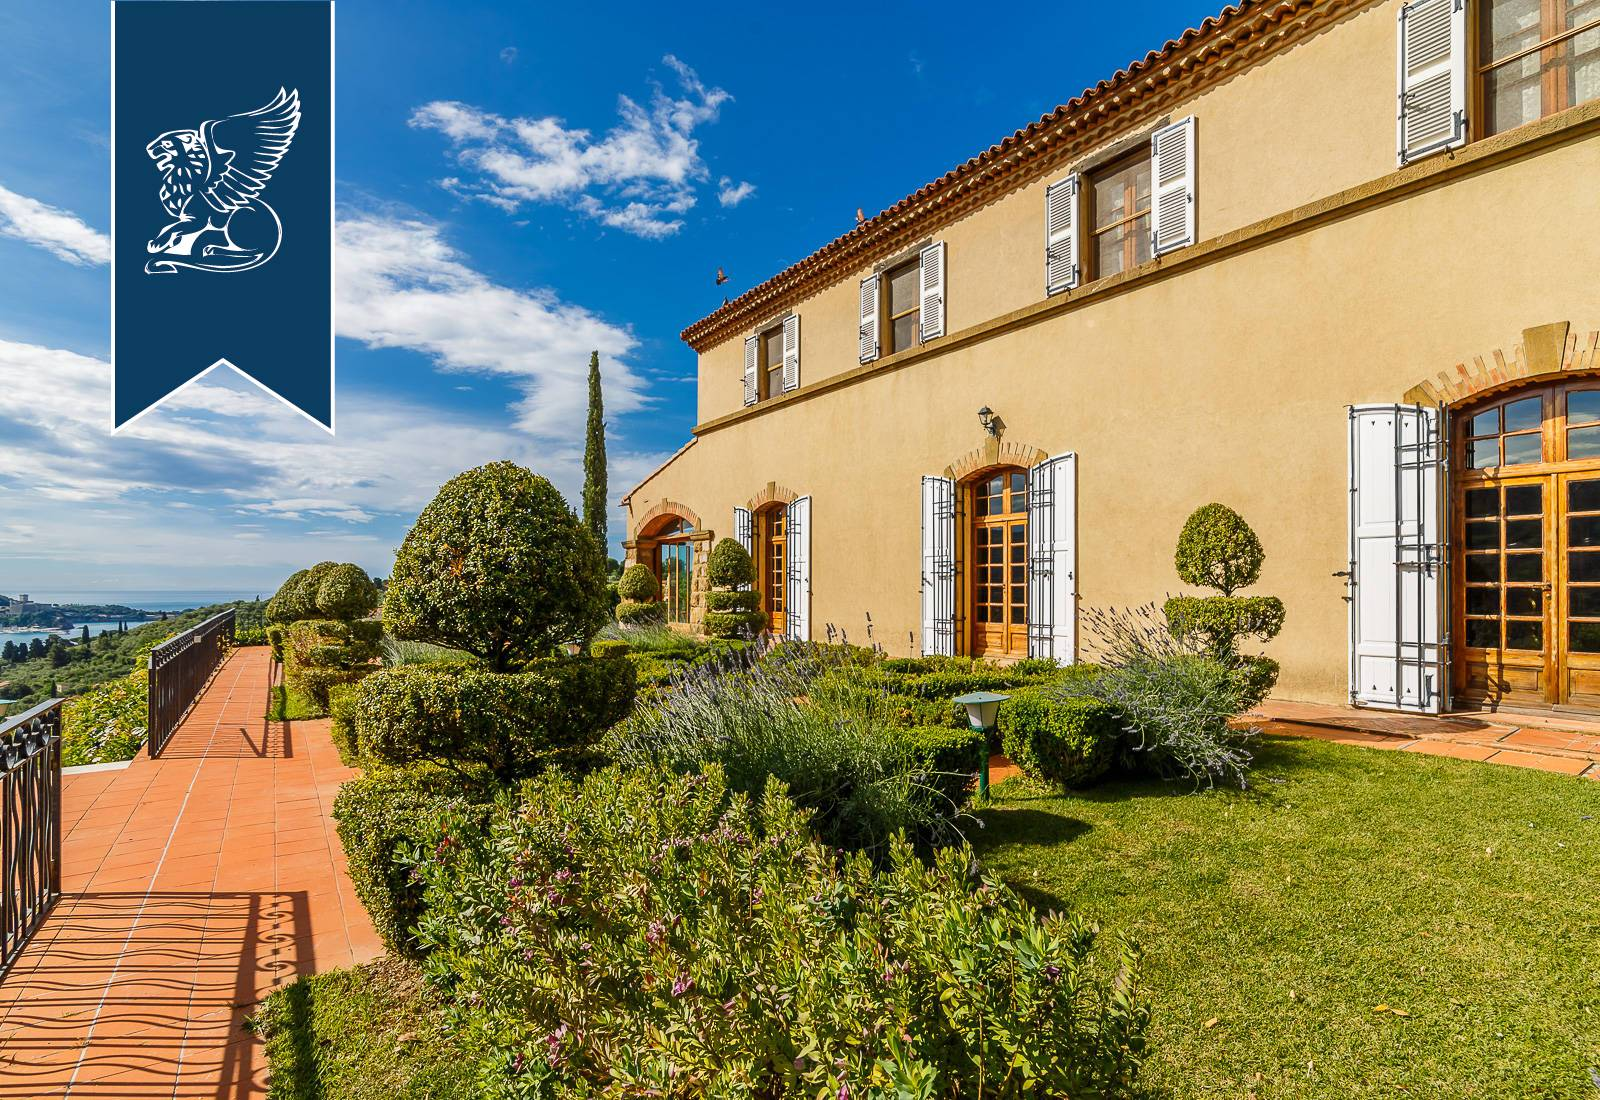 Villa in Vendita a Lerici: 0 locali, 620 mq - Foto 3